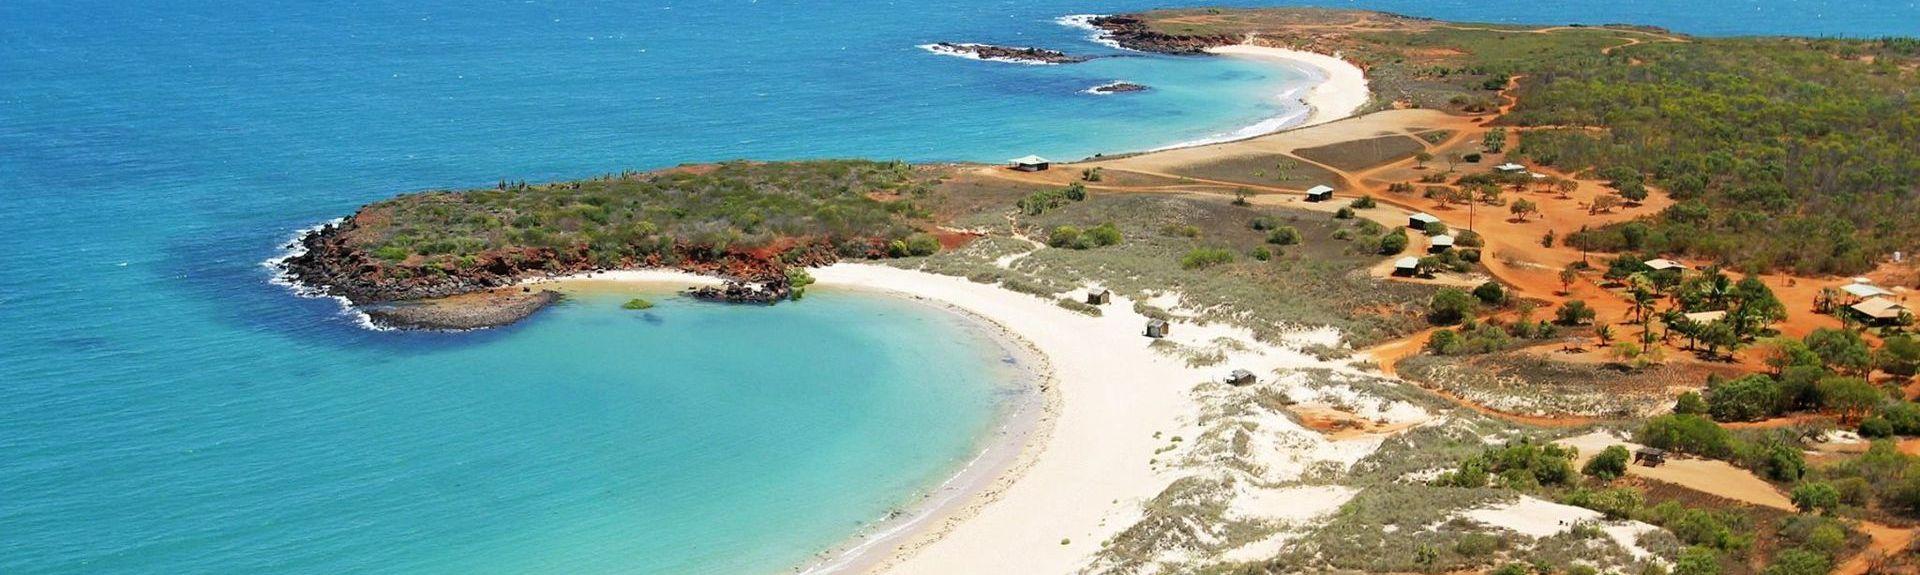 Cable Beach, WA, Australia